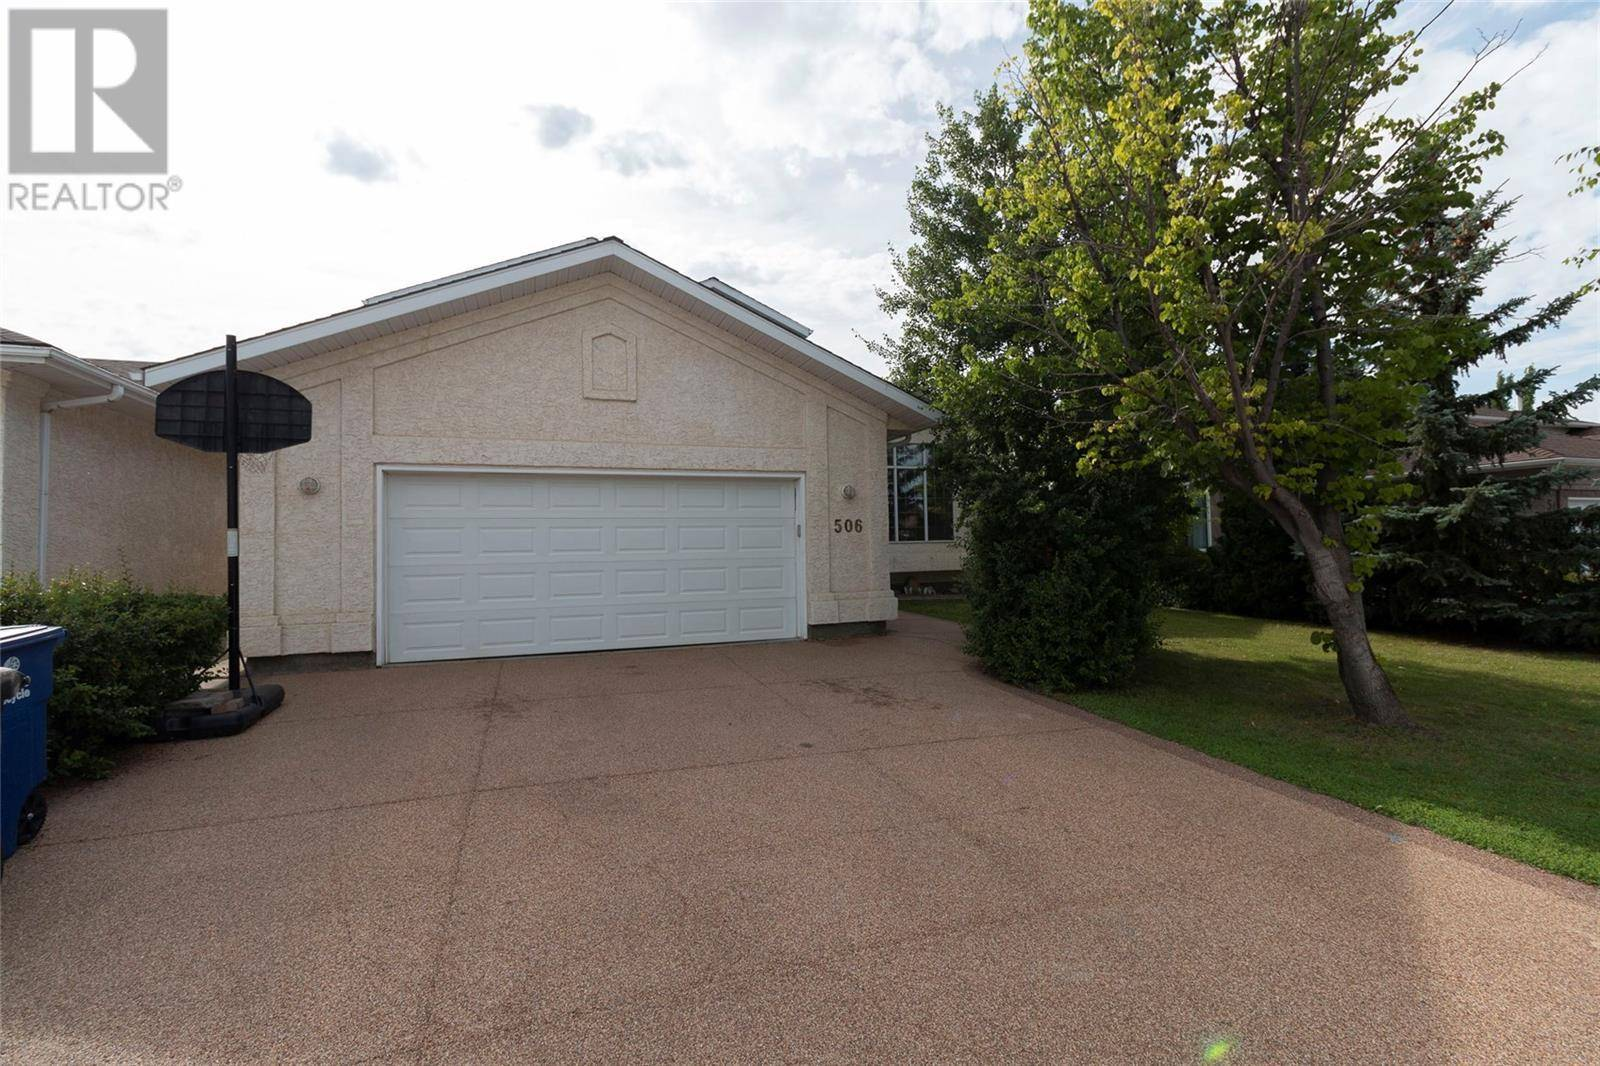 House for sale at 506 Blackthorn Cres Saskatoon Saskatchewan - MLS: SK779462